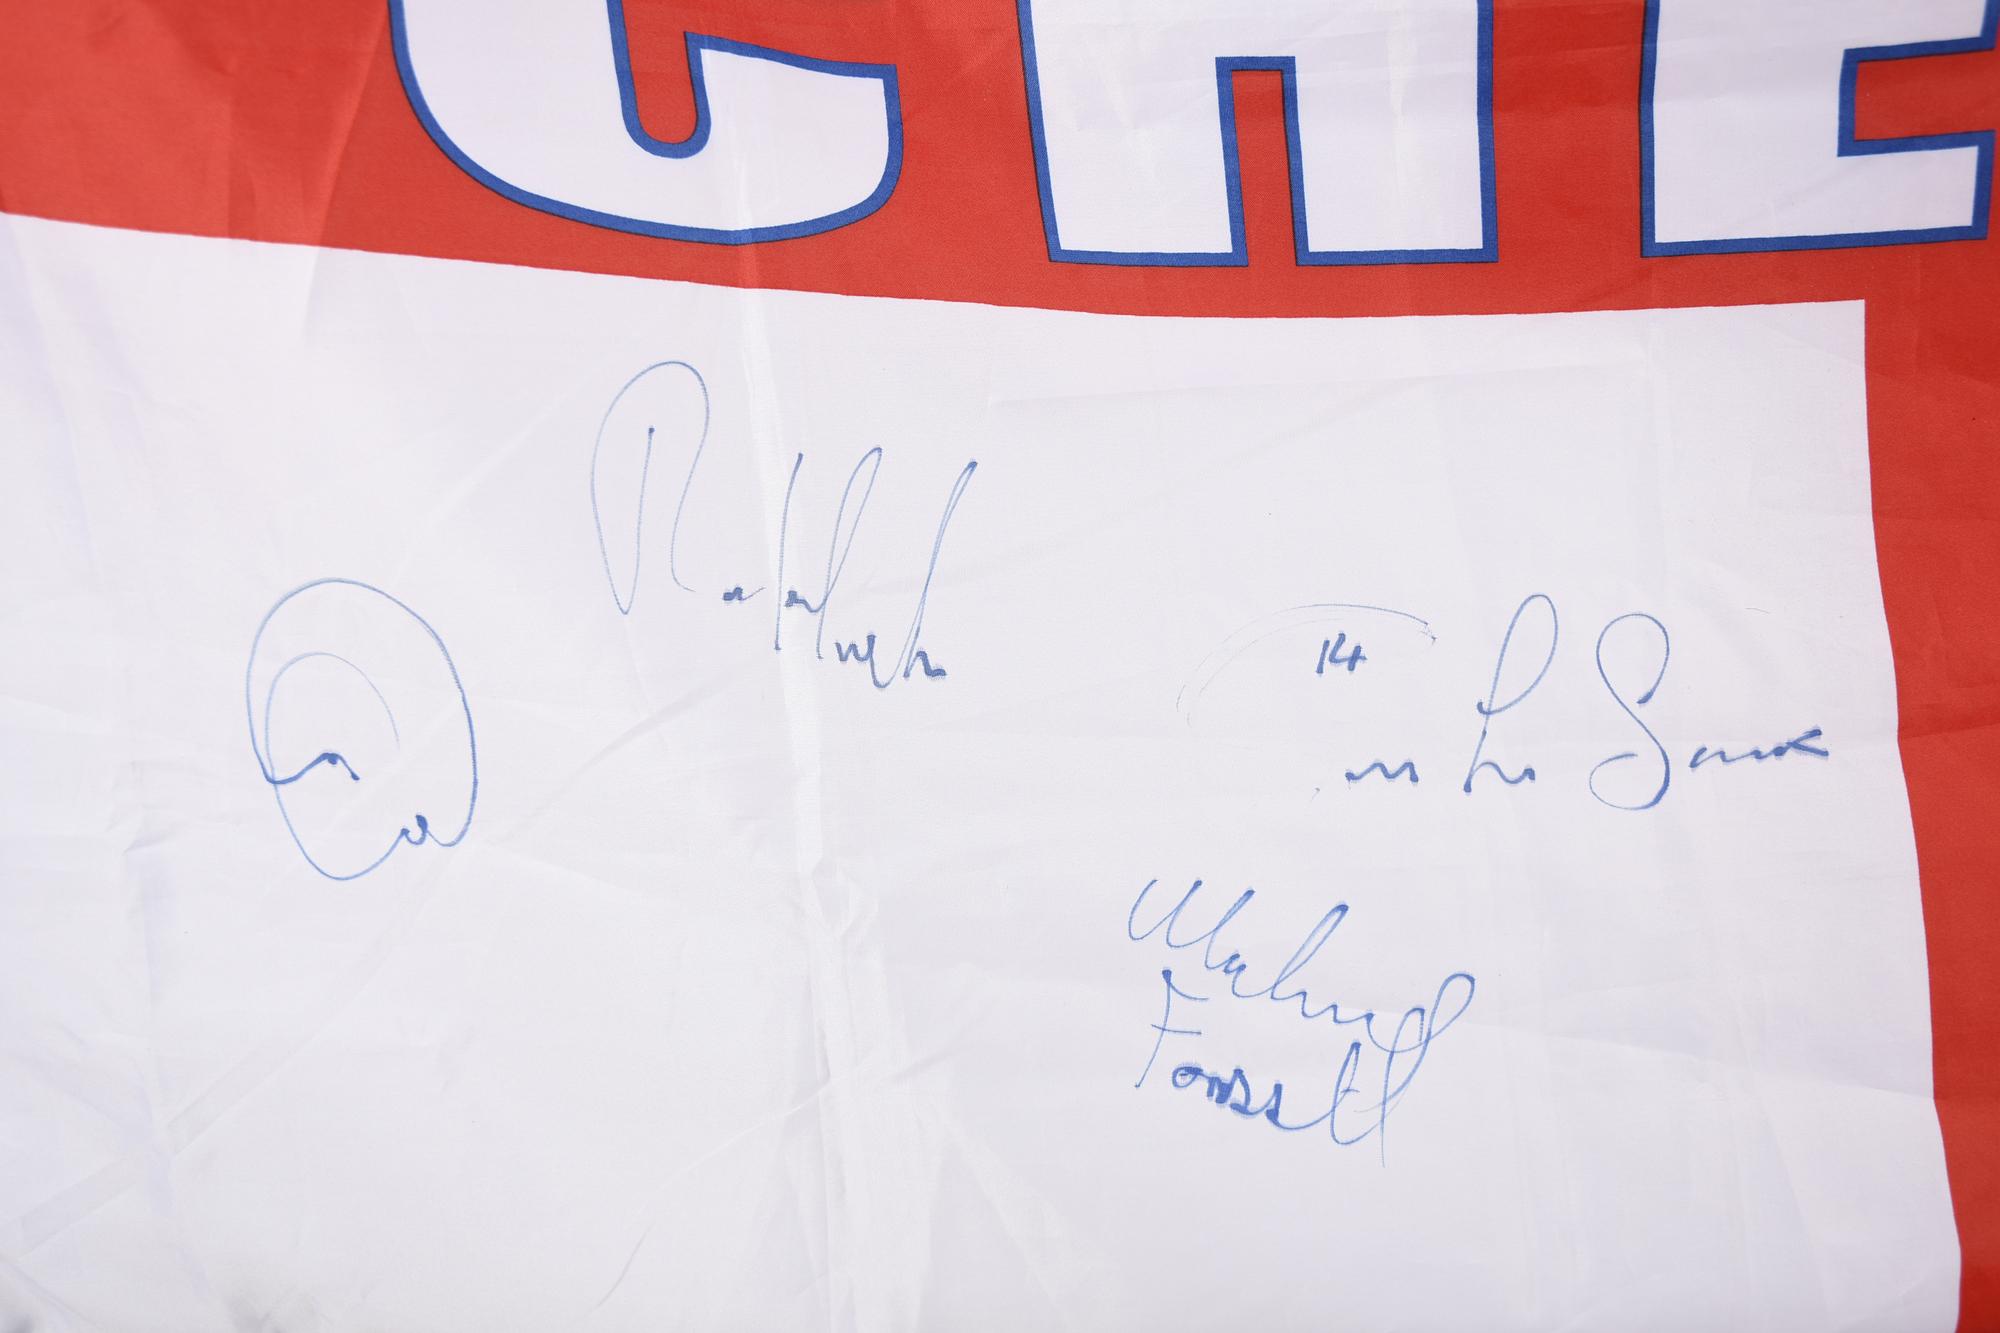 CHELSEA STARS & SIGNED FLAG Original Signature - Image 3 of 11